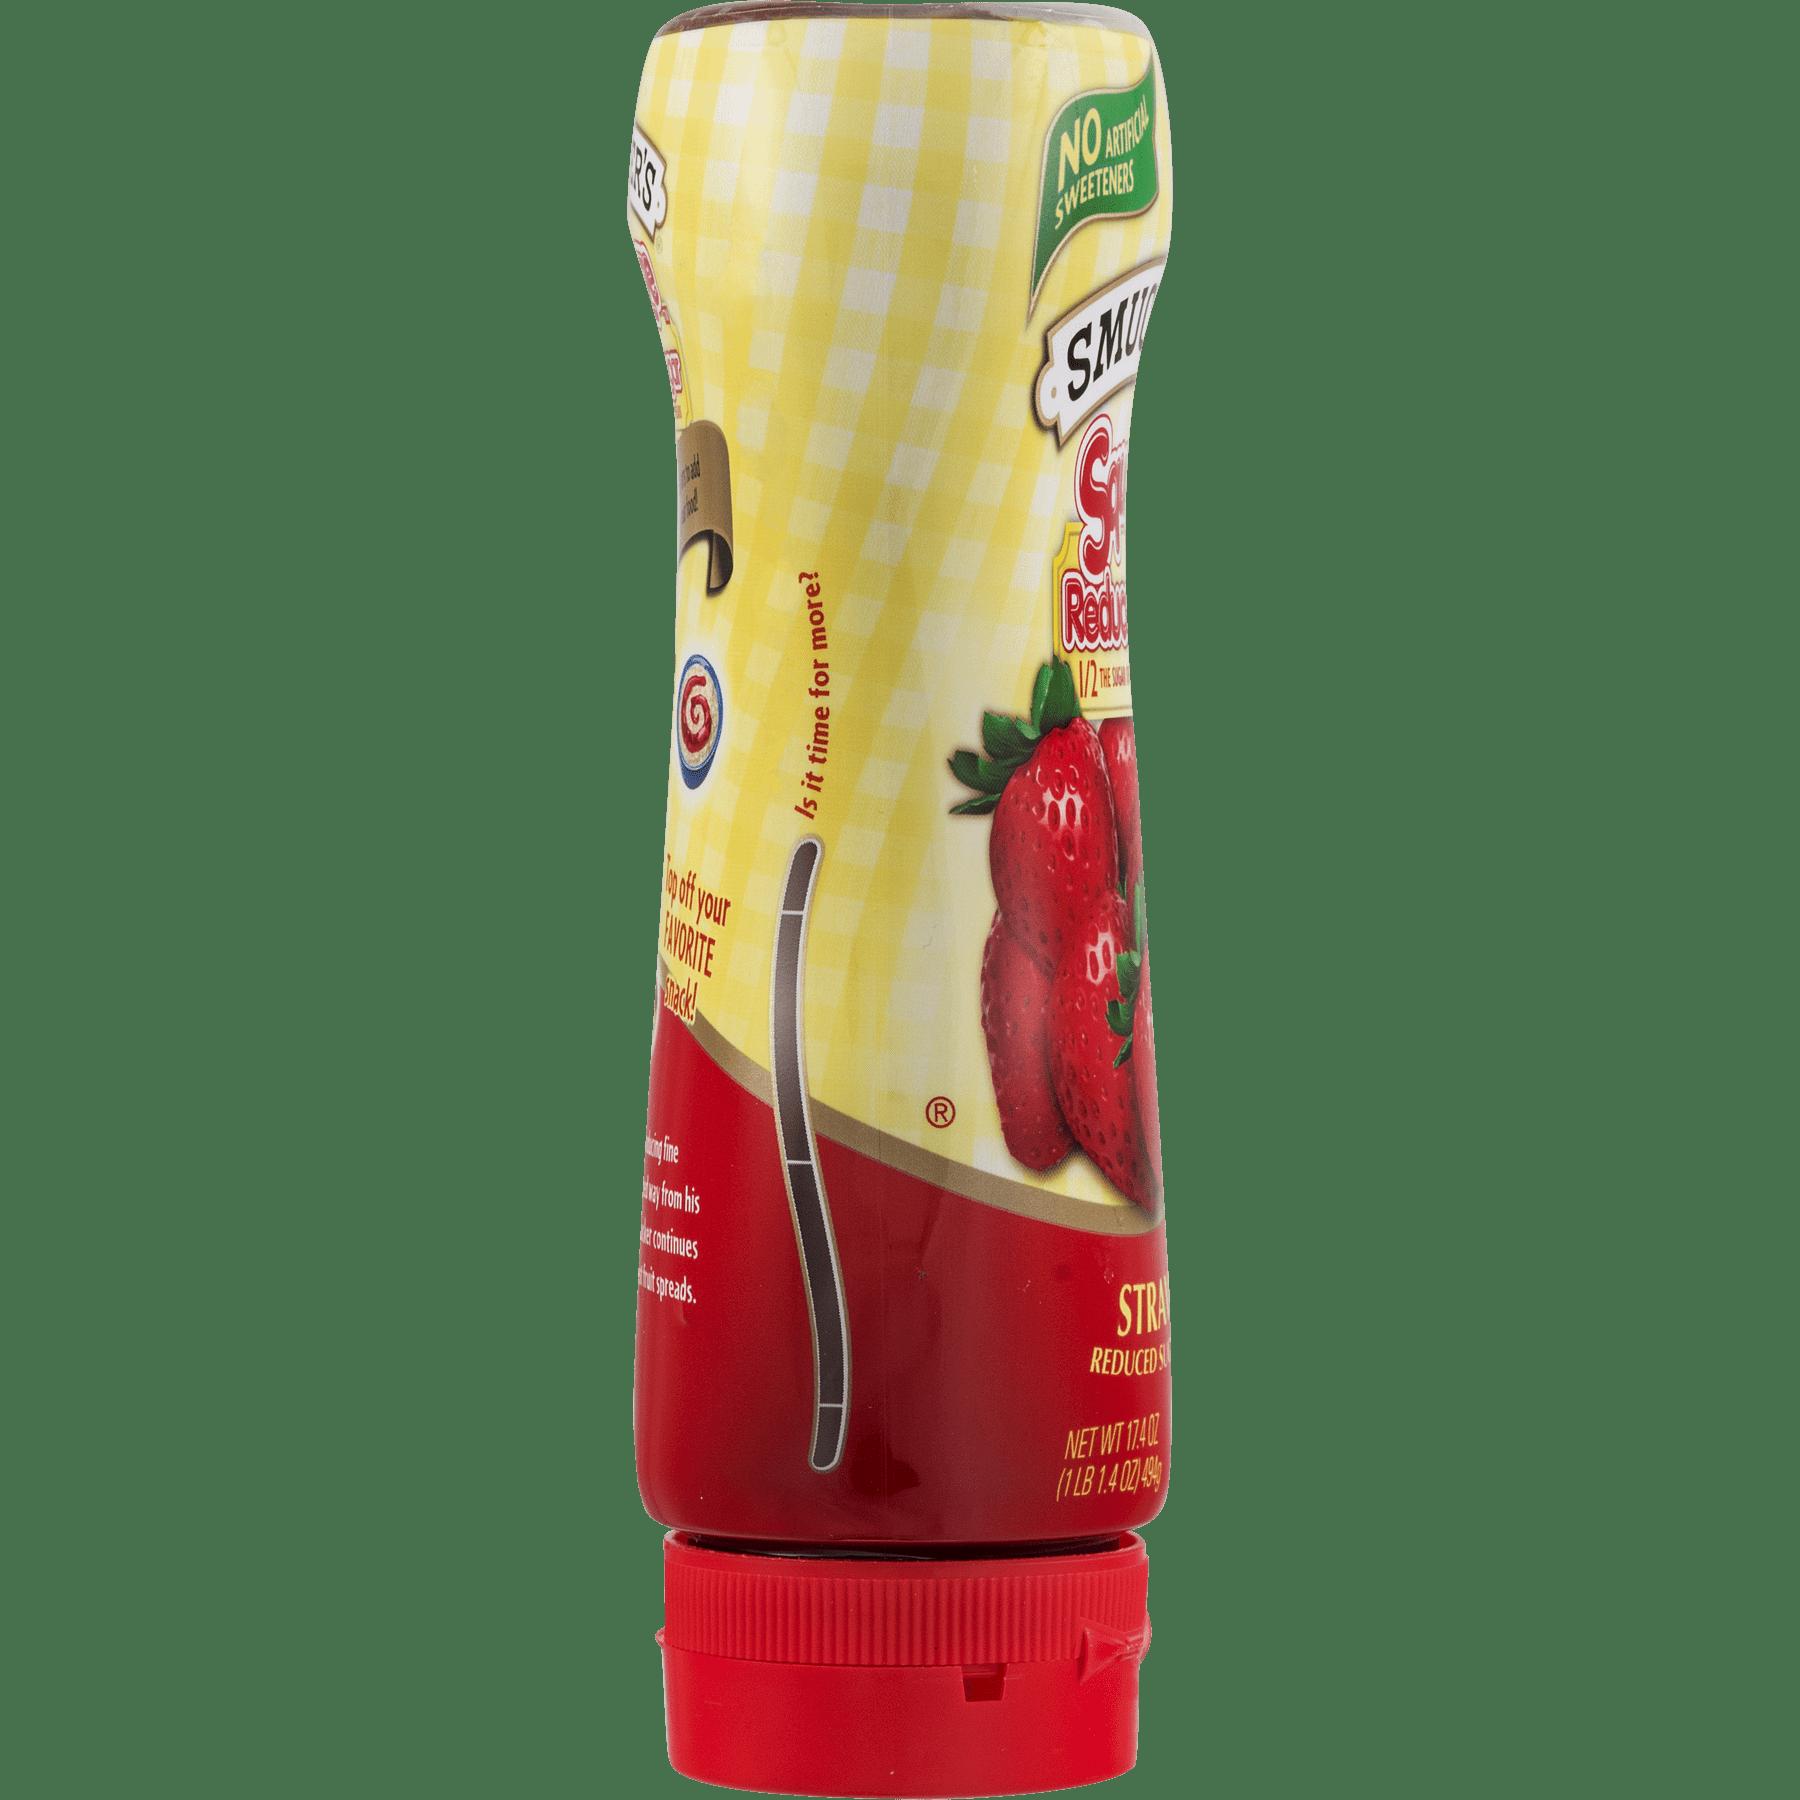 Smucker's Squeeze Reduced Sugar Fruit Spread Strawberry, 17.4 oz